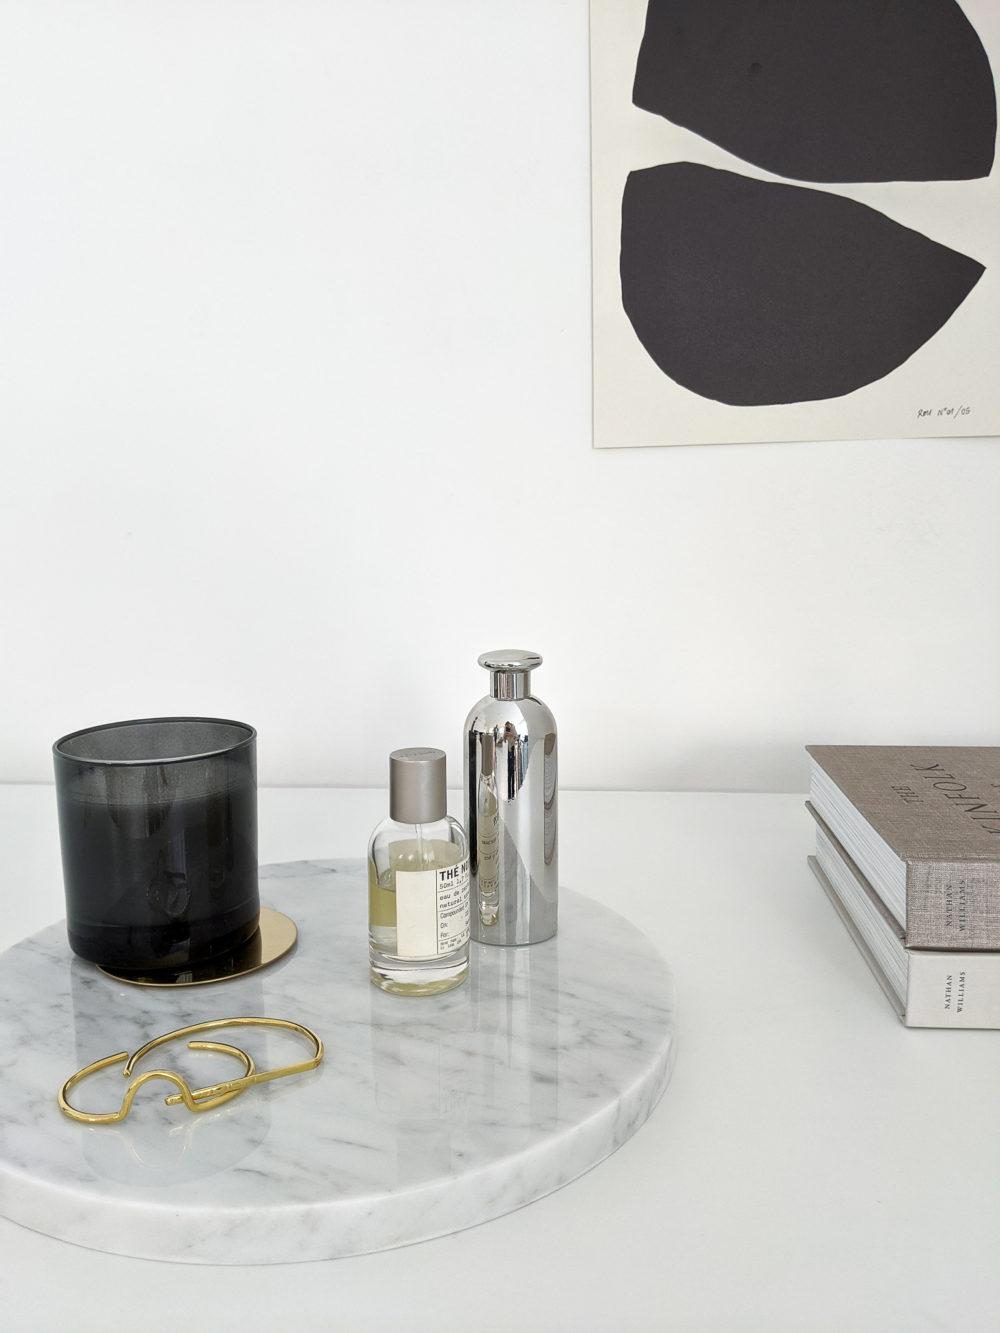 Artful Accessorizing: The Minimalist Home Objects